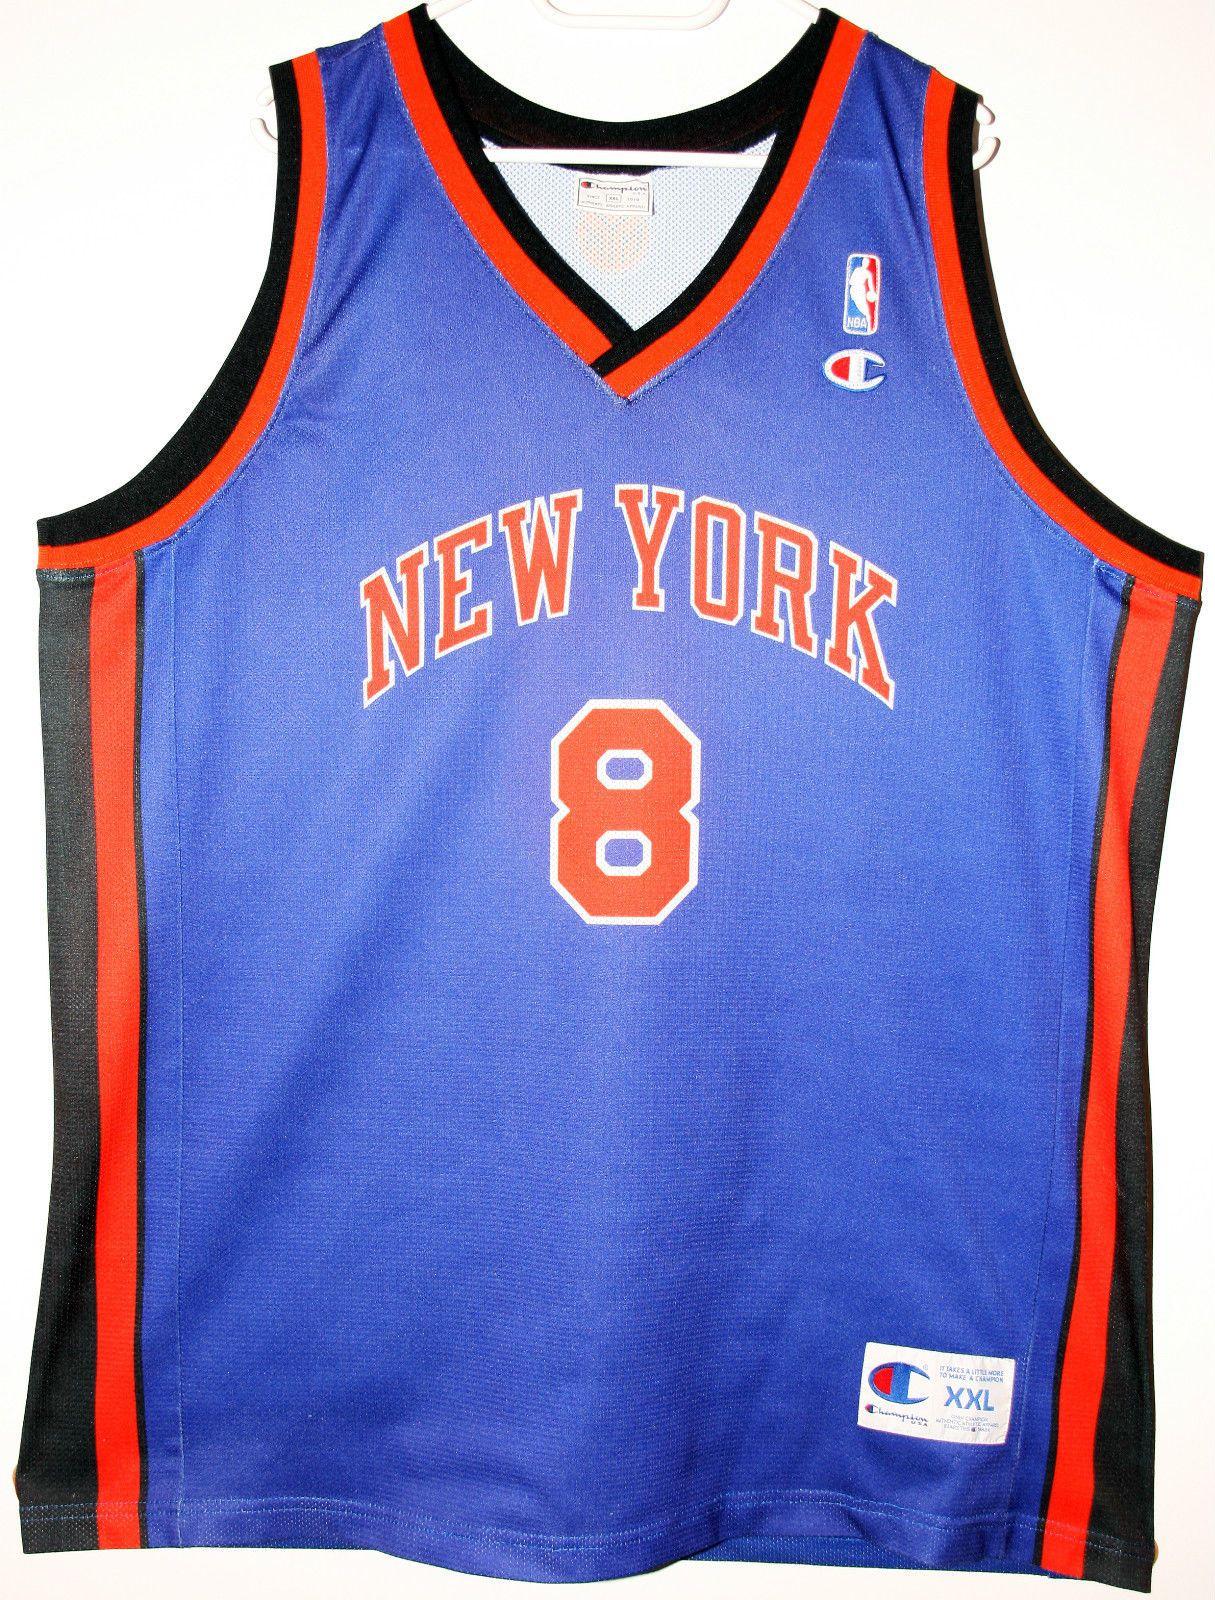 Champion NBA Basketball New York Knicks #8 Latrell Sprewell Trikot/Jersey Size 52 - Größe XXL - 49,90€ #nba #basketball #trikot #jersey #ebay #sport #fitness #fanartikel #merchandise #usa #america #fashion #mode #collectable #memorabilia #allbigeverything